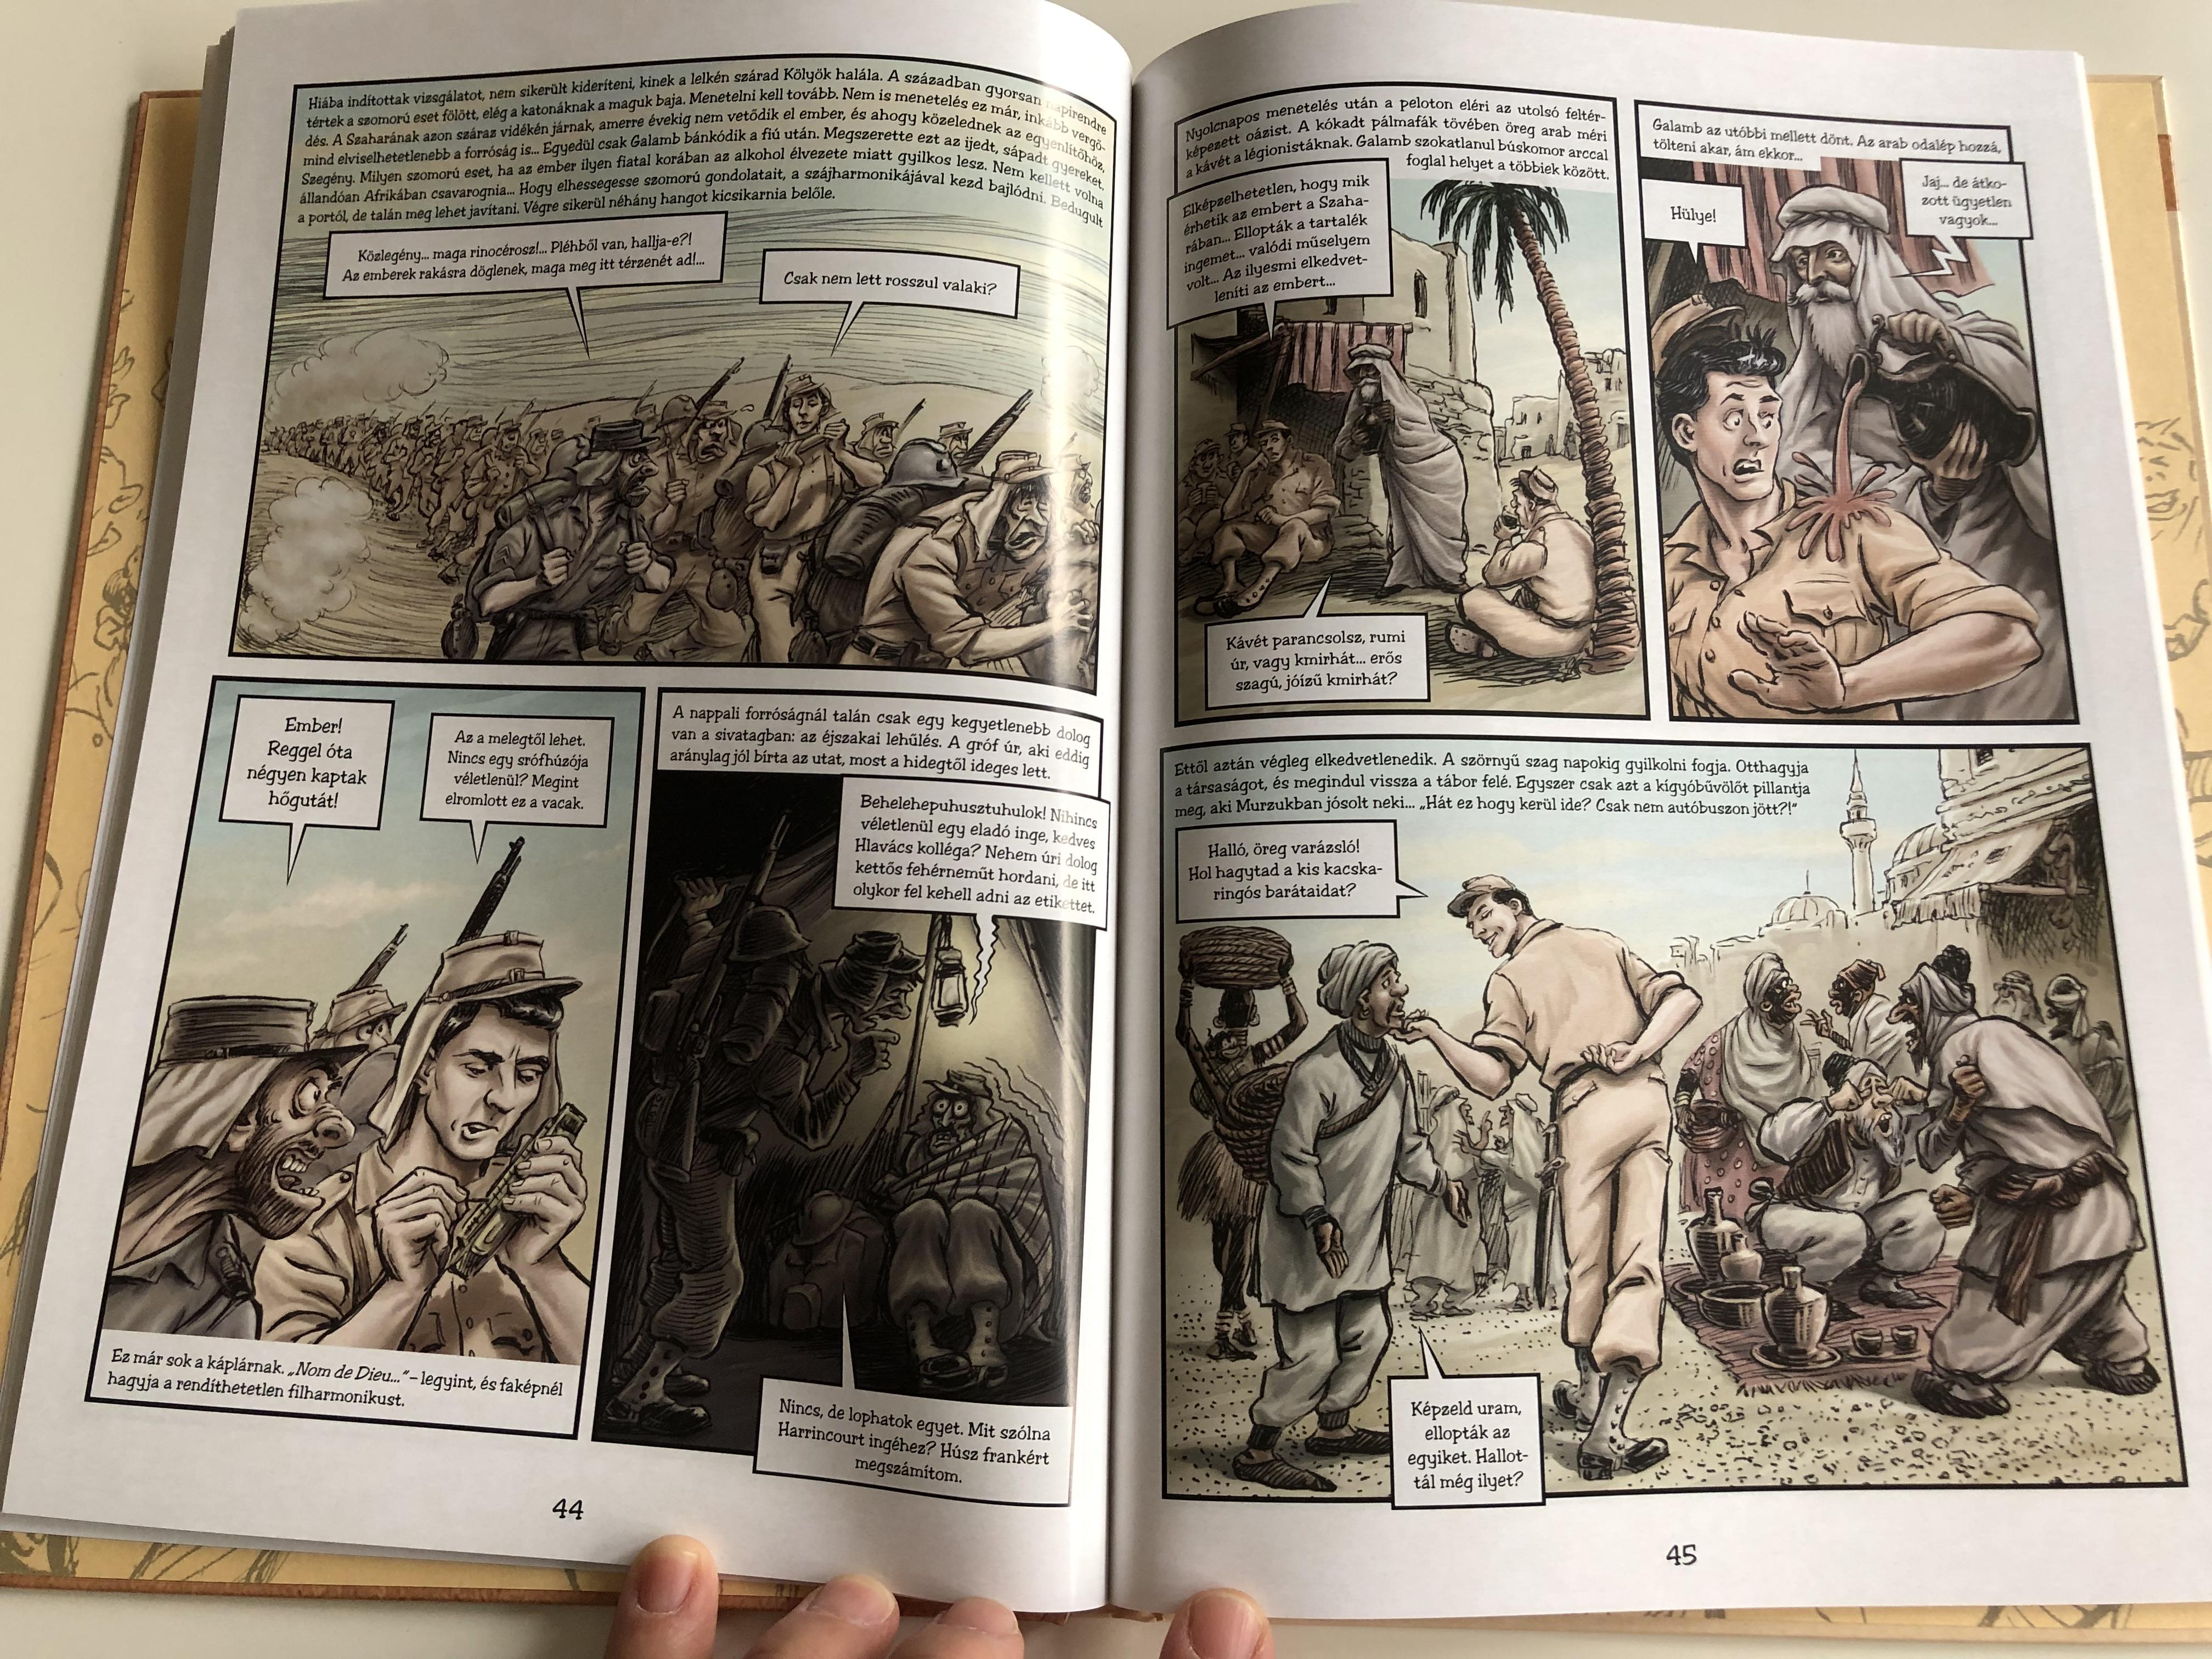 az-el-tretolt-hely-rs-g-by-rejt-jen-korcsm-ros-p-l-sz-nes-k-preg-ny-the-frontier-garrison-color-comic-book-hardcover-2013-3rd-edition-k-pes-kiad-8-.jpg